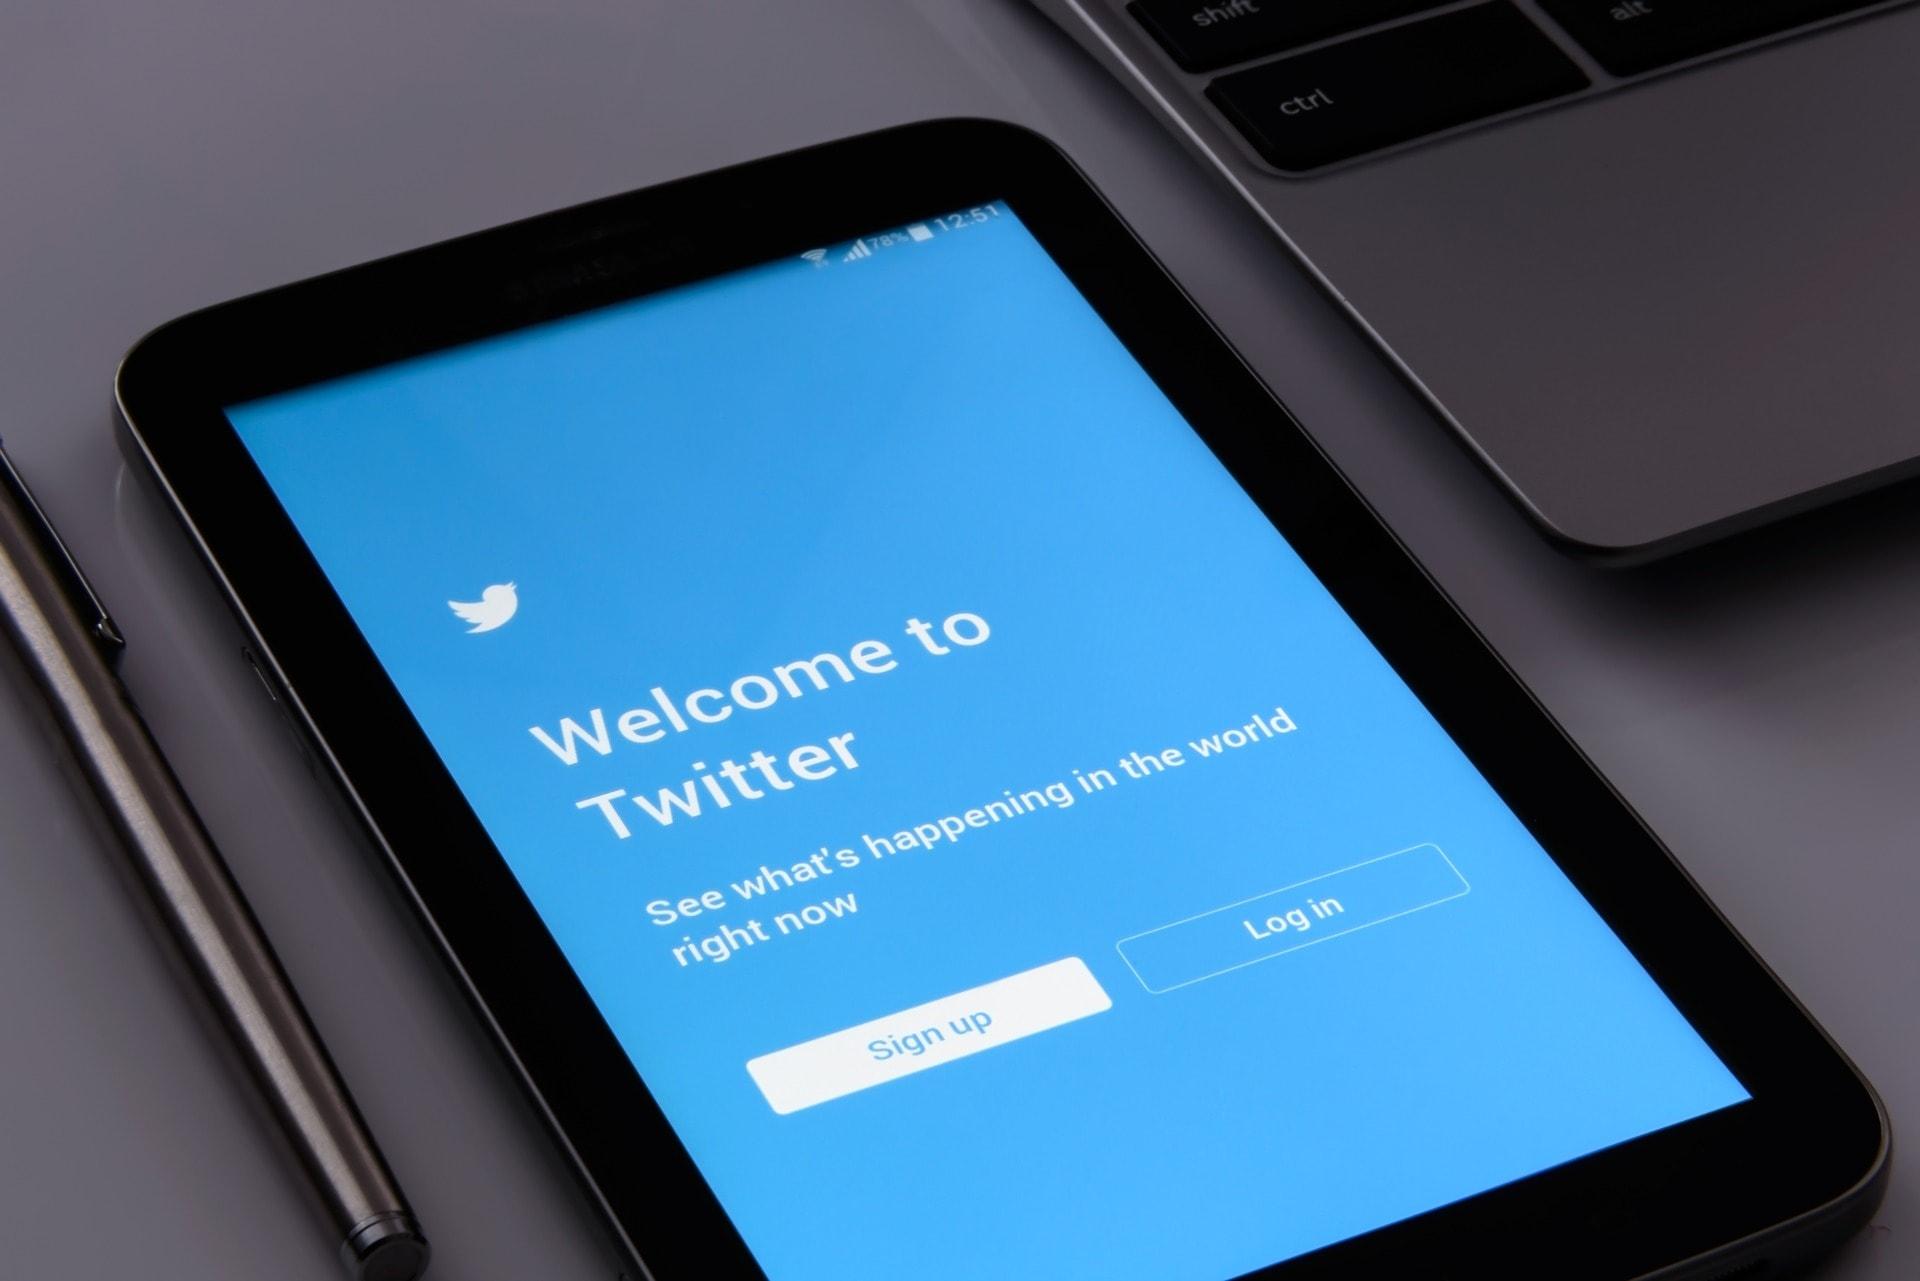 twitter sosyal medya hesabı yoneterek para kazanma